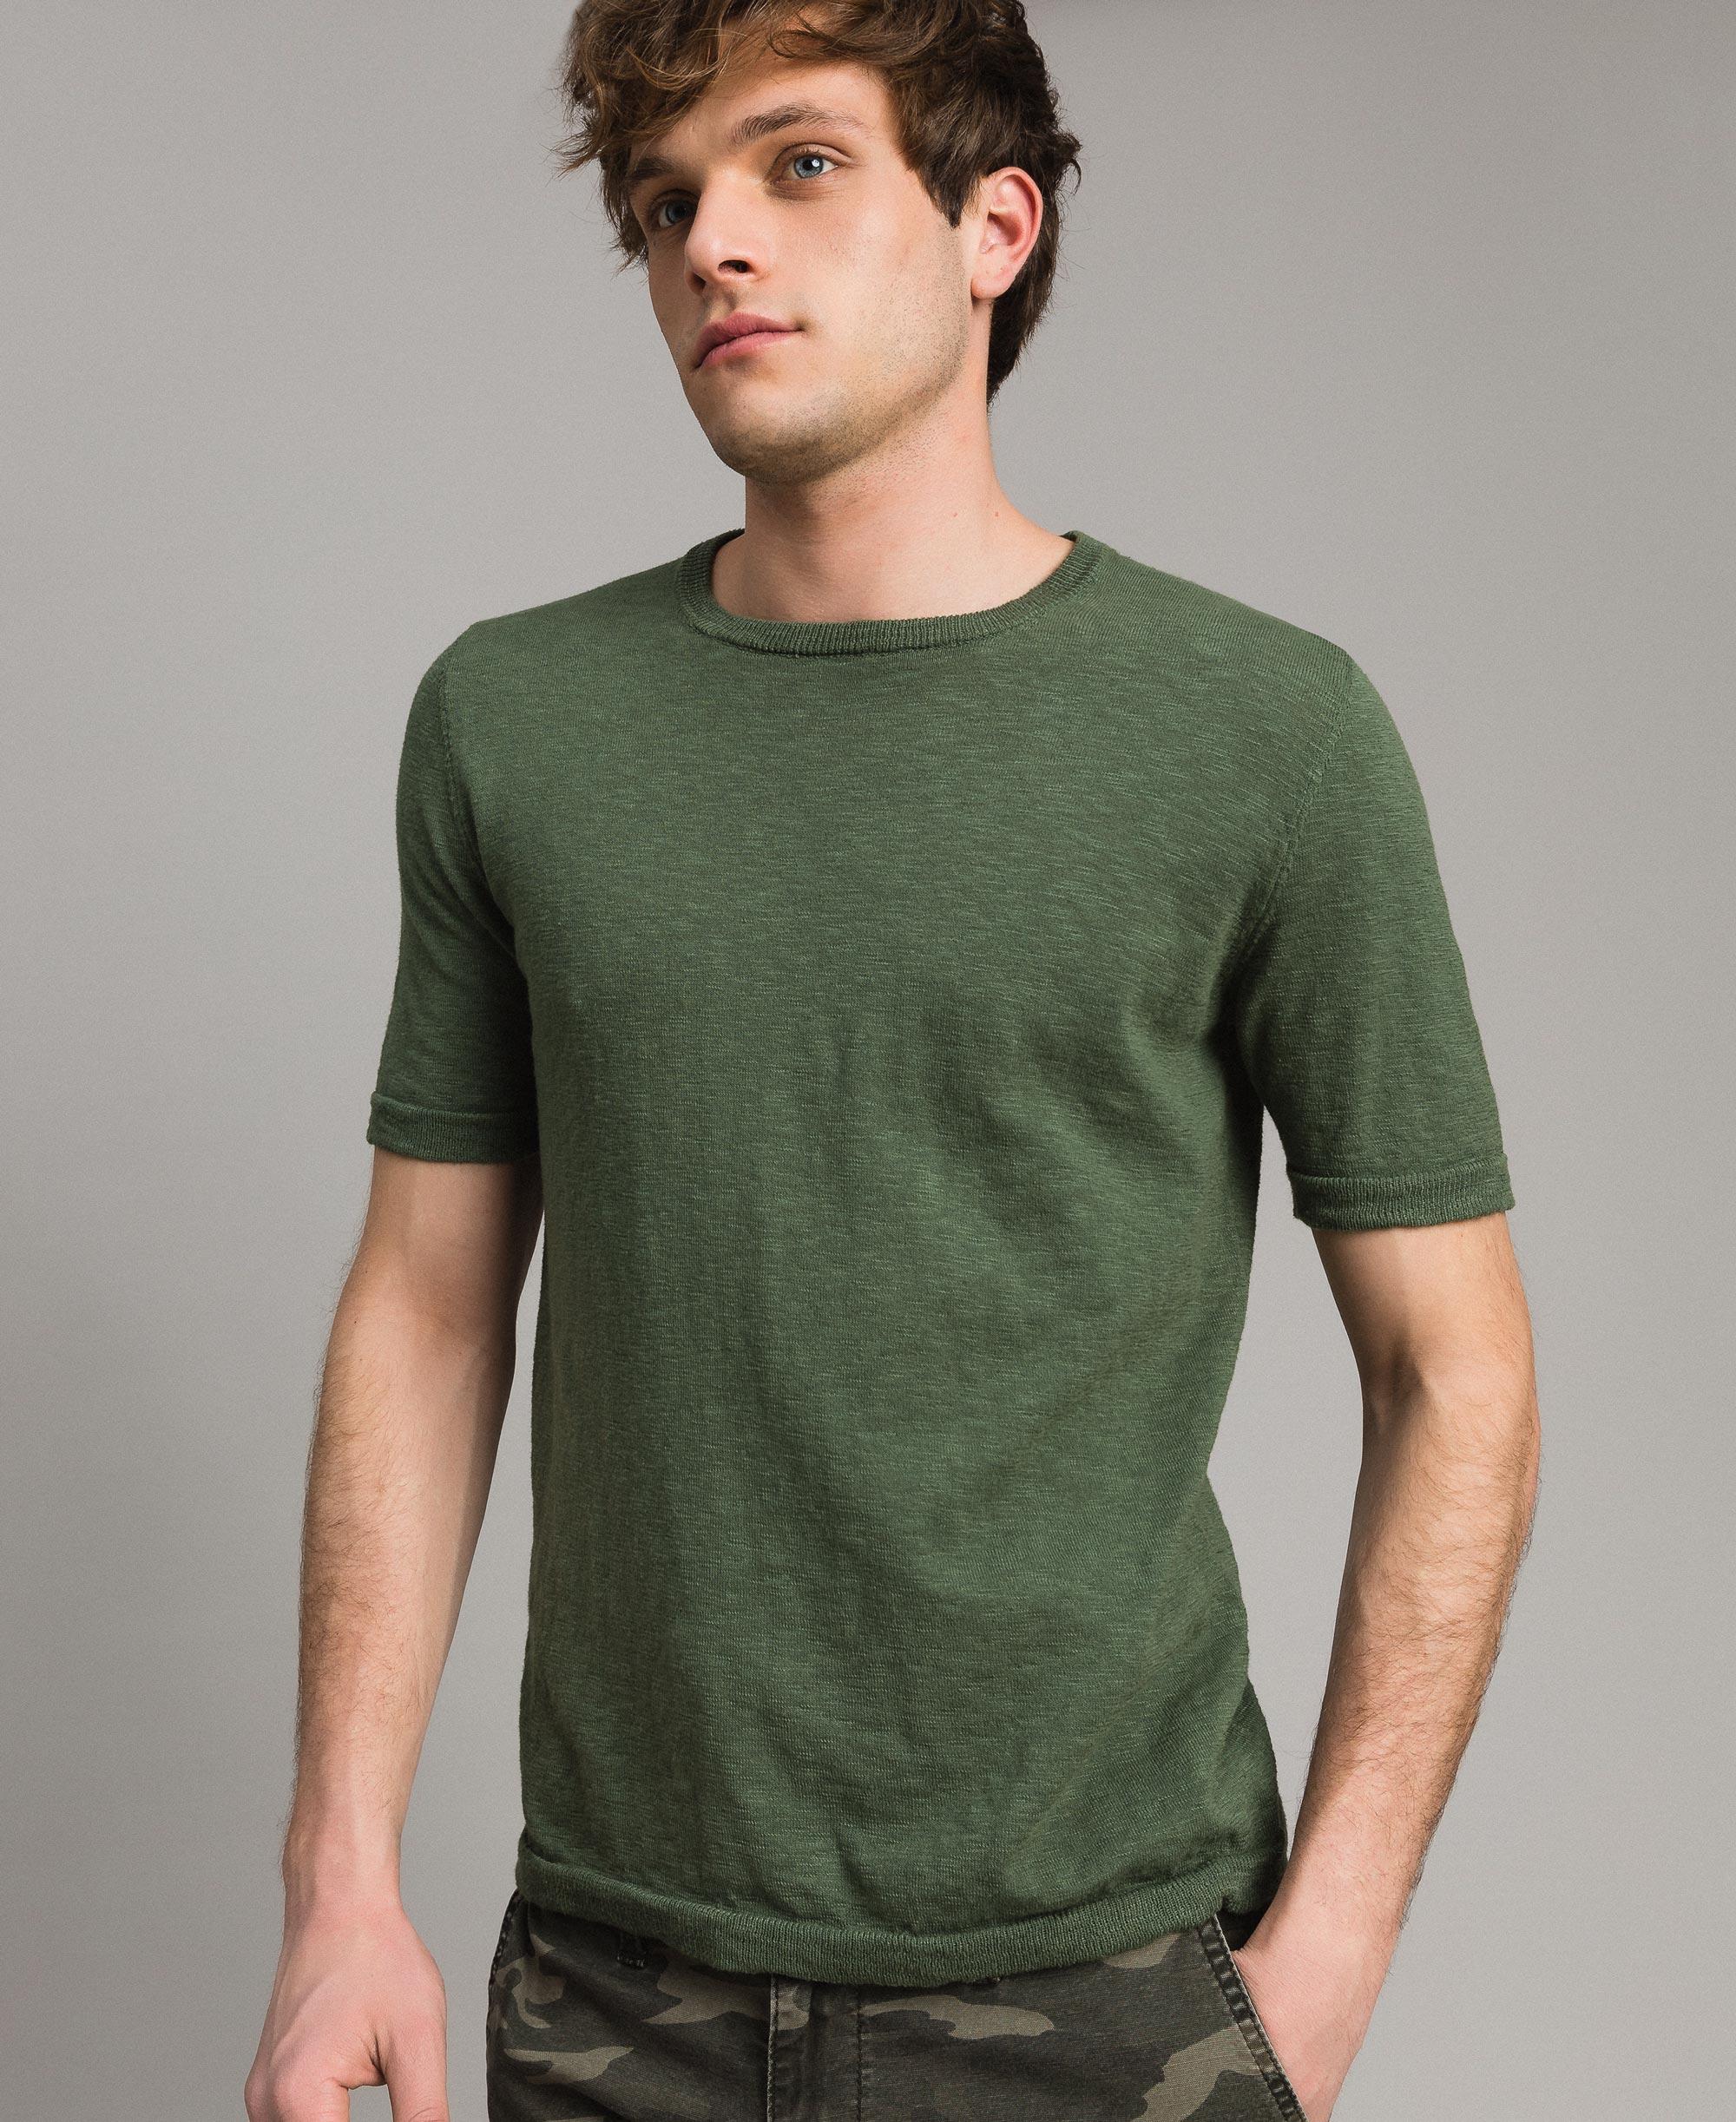 Cotton blend slub T shirt Man, Black | TWINSET Milano